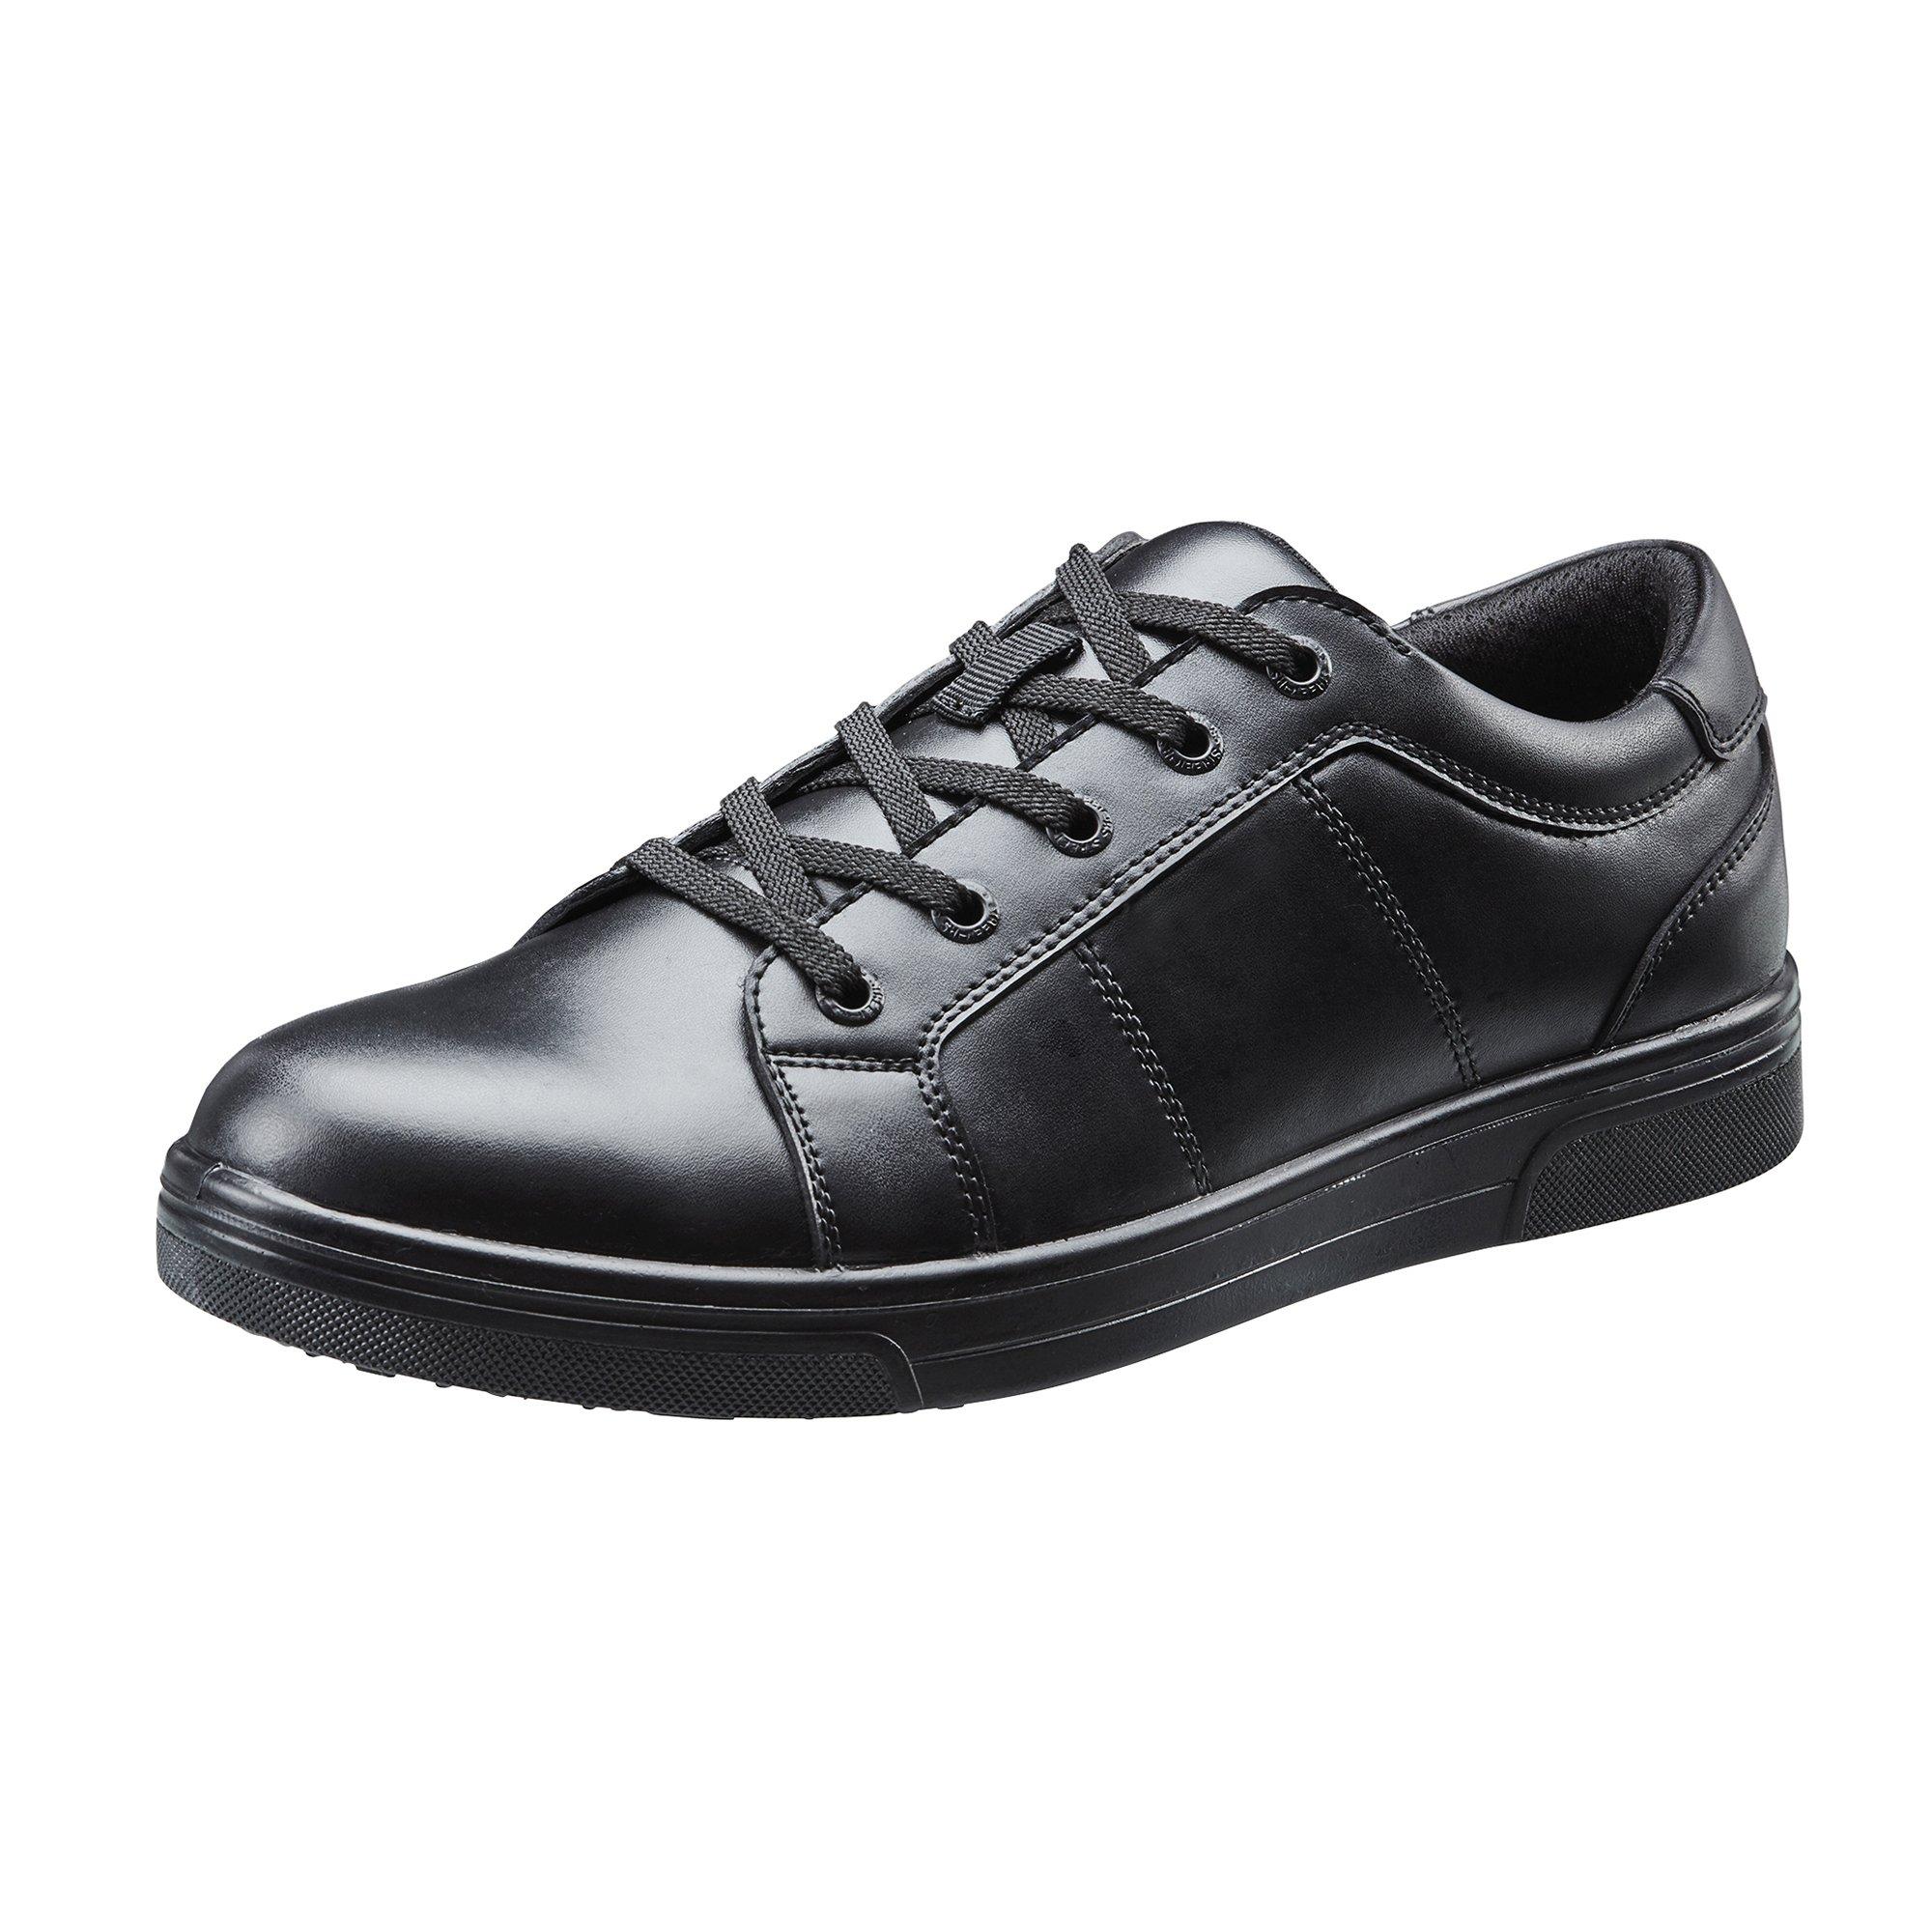 Kids School Shoes Children's Black